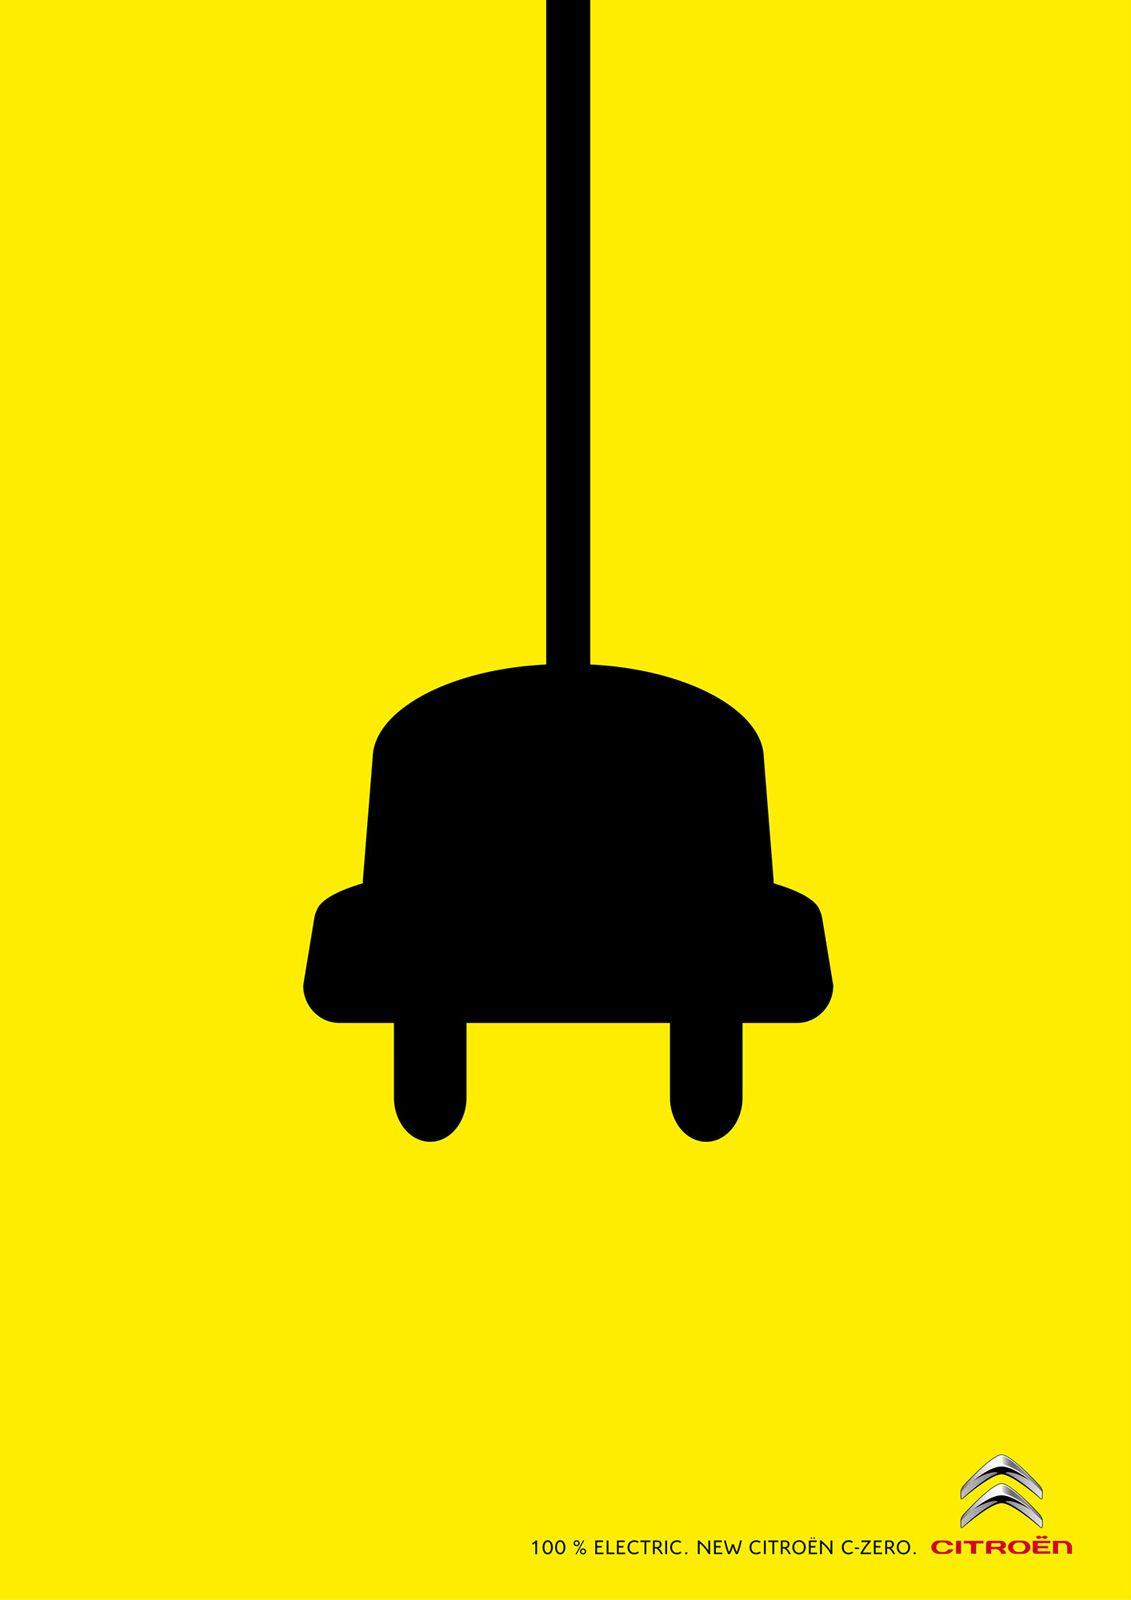 Citroën C Zero 100 Electric Ads Of The World クリエイティブ 名刺 フォント 創意